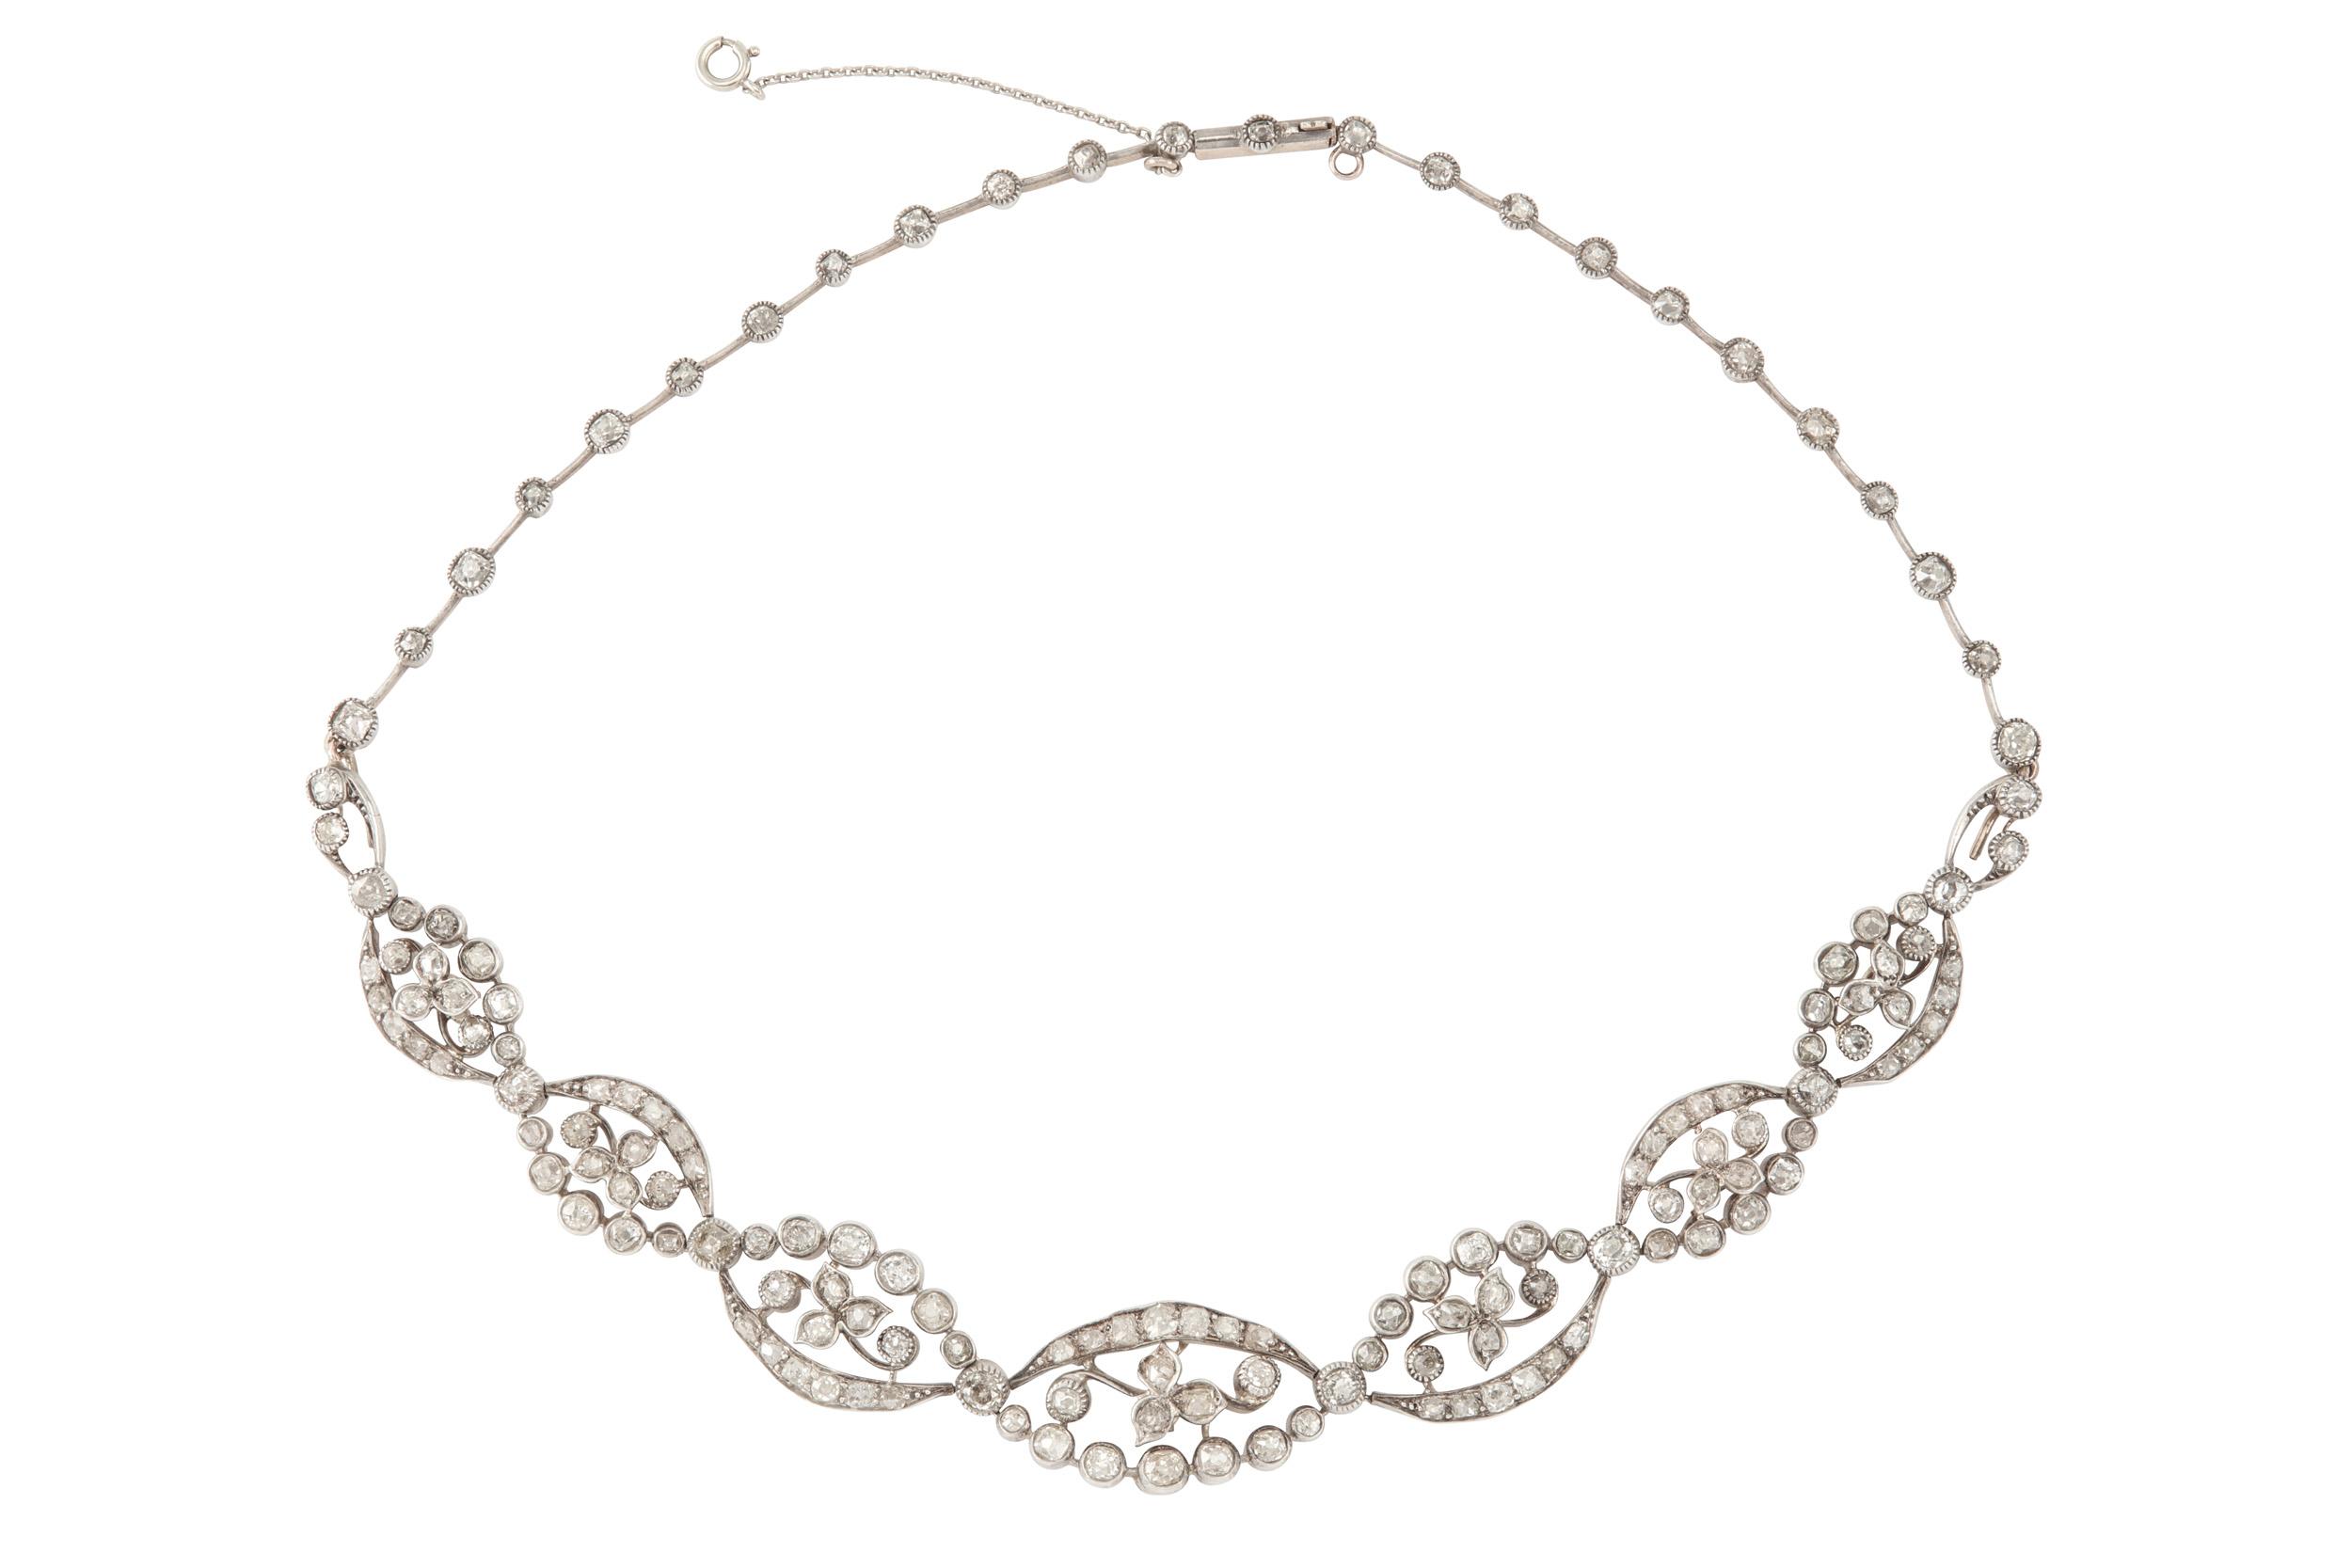 Lot 1 - A diamond tiara / necklace, early 20th century